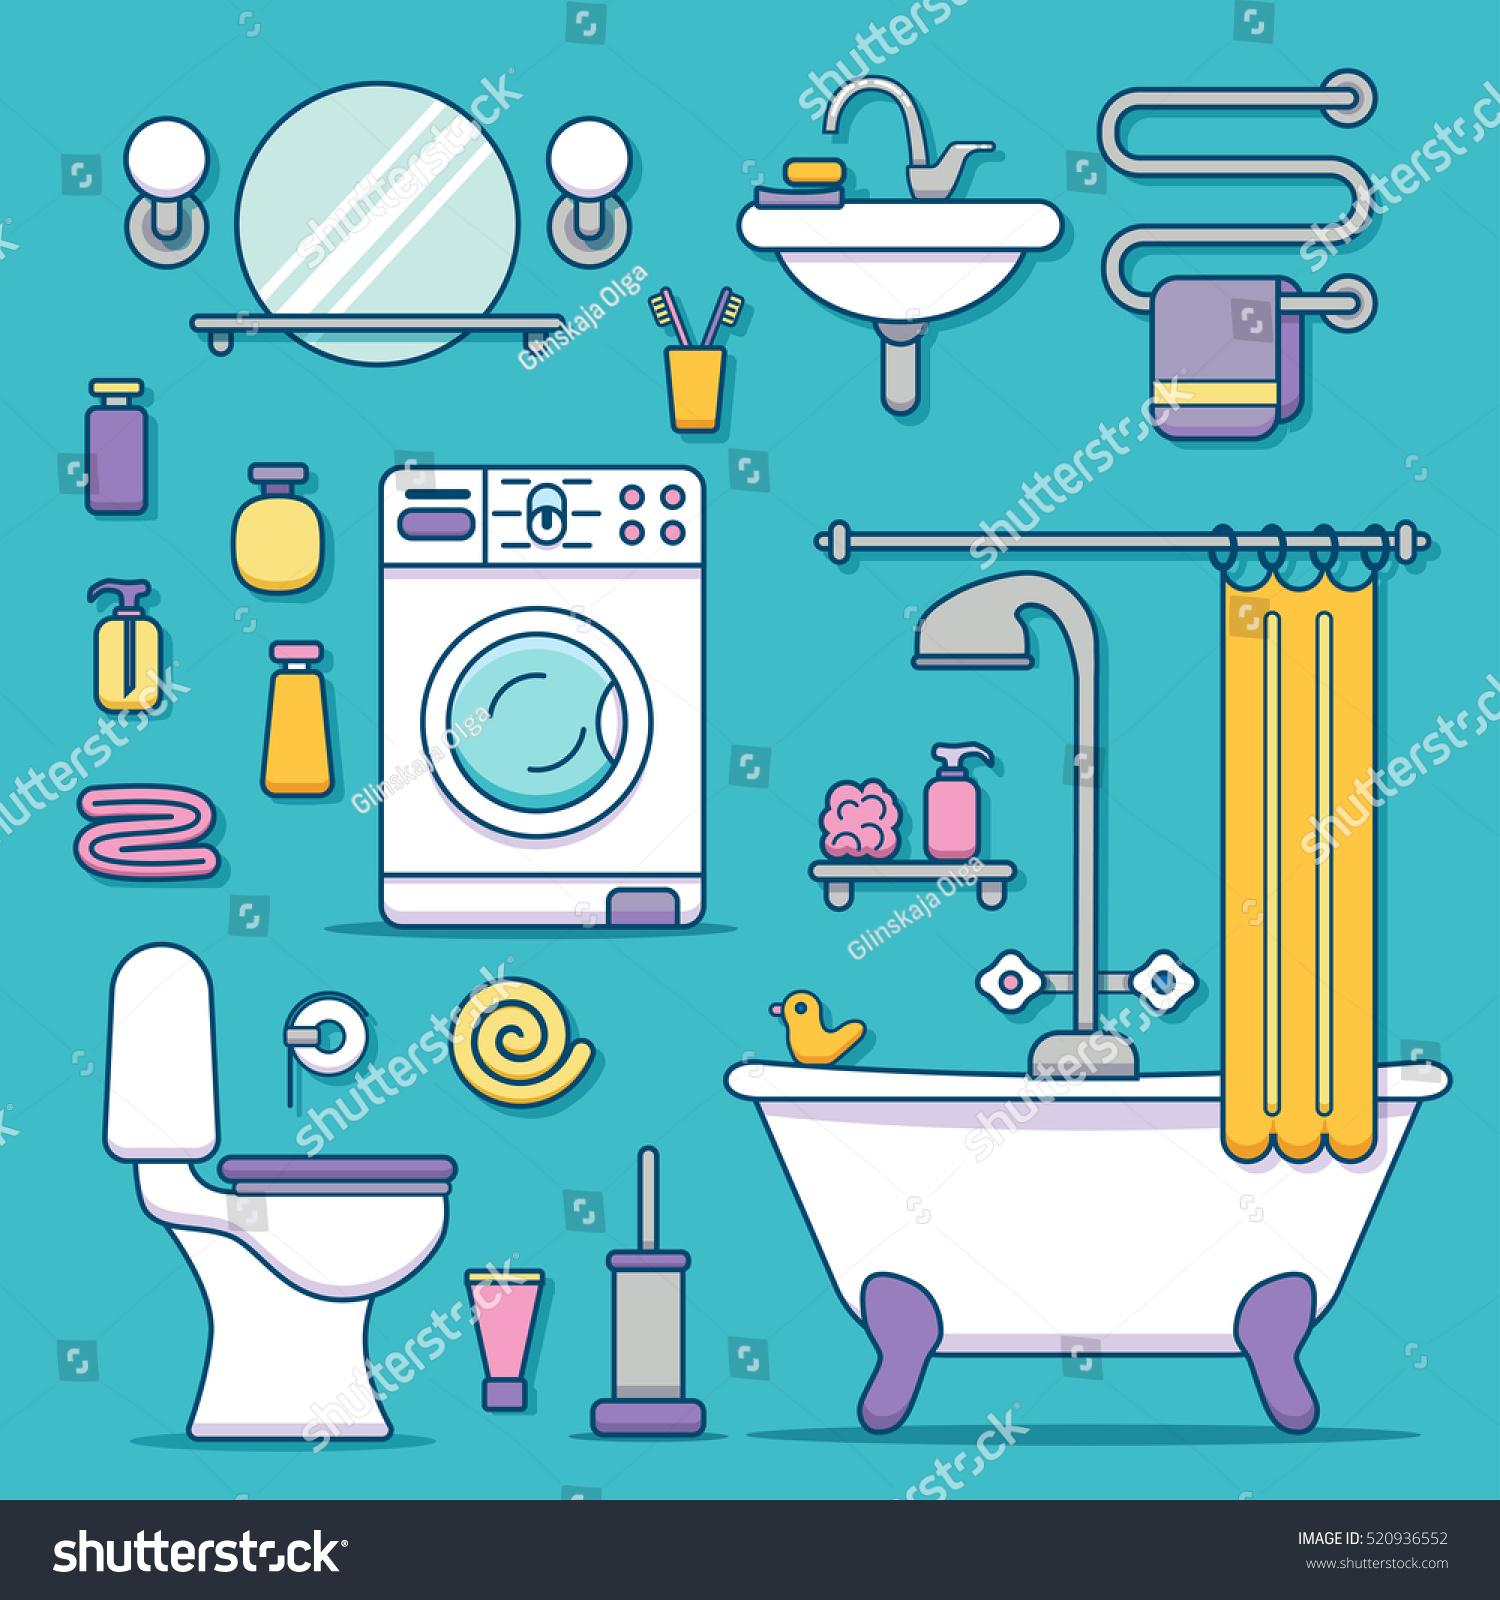 bath equipment icons made modern line stock vector 520936552 shutterstock. Black Bedroom Furniture Sets. Home Design Ideas